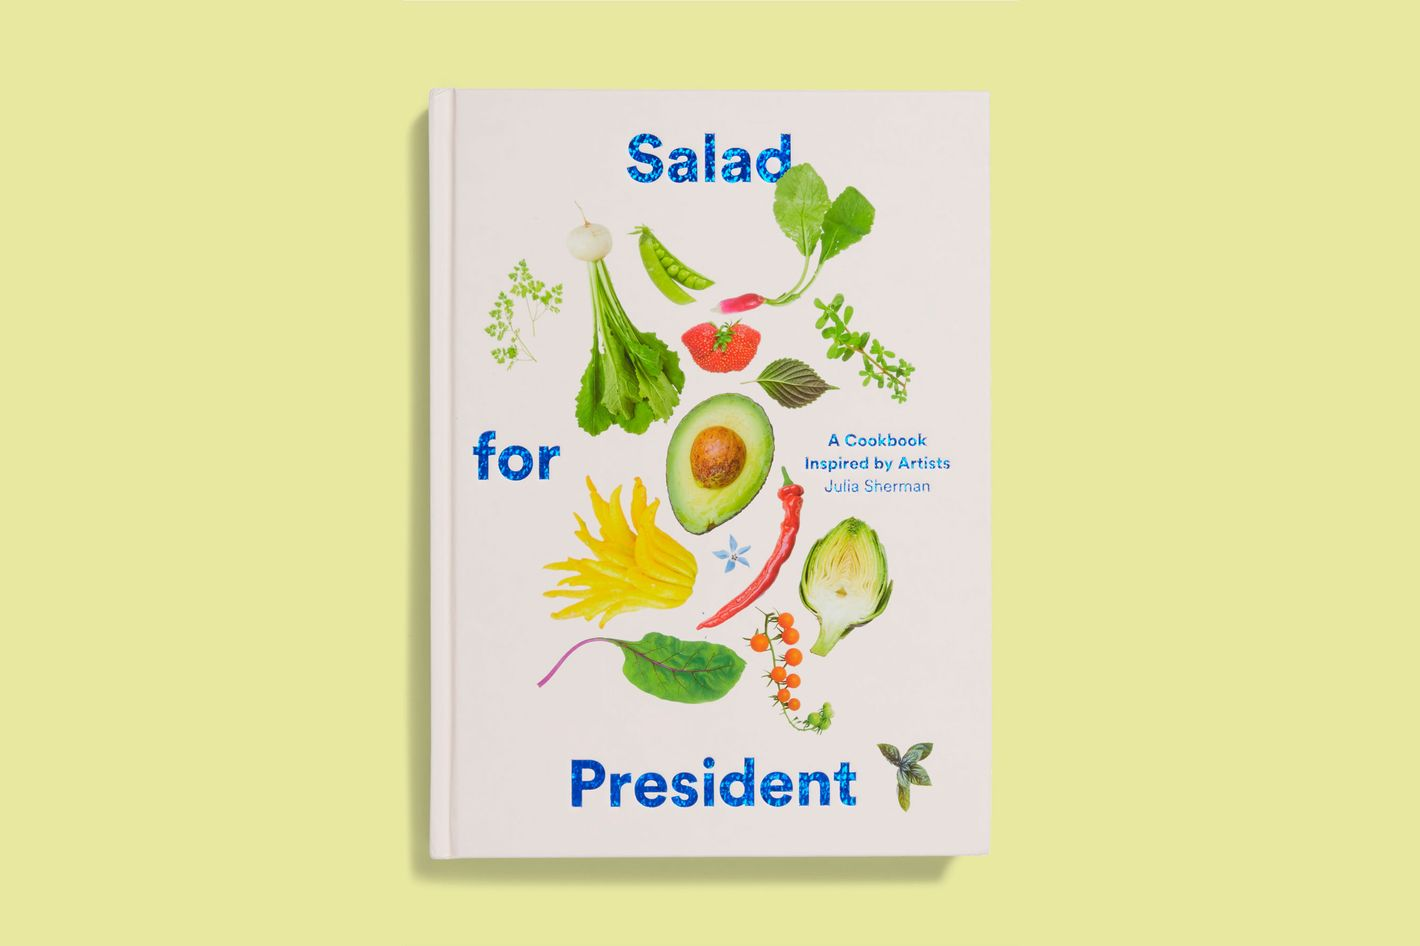 'Salad for President' by Julia Sherman